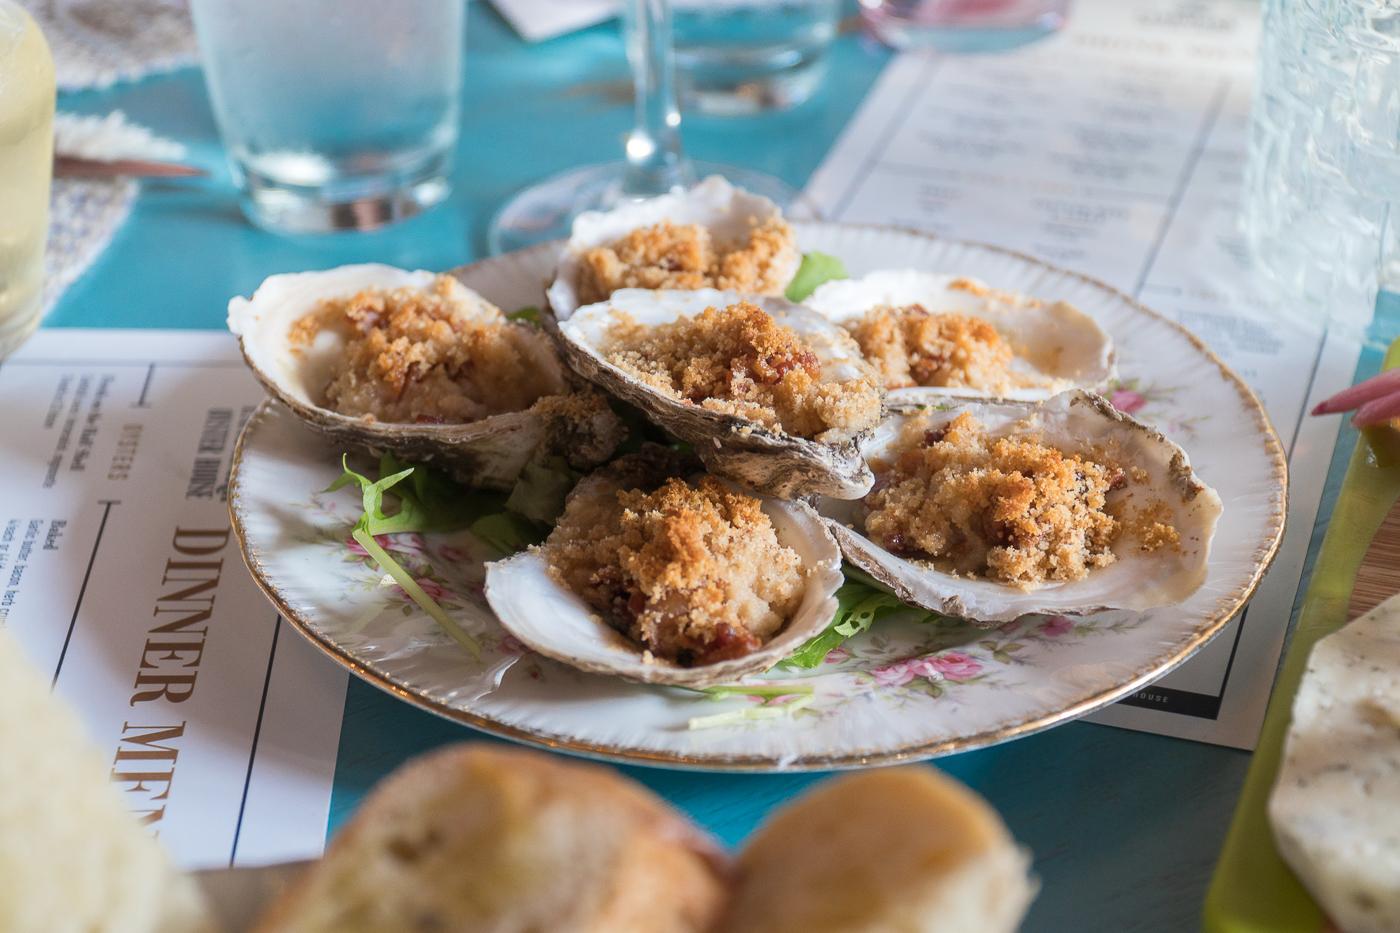 Huîtres gratinées au Landmark Oyster House